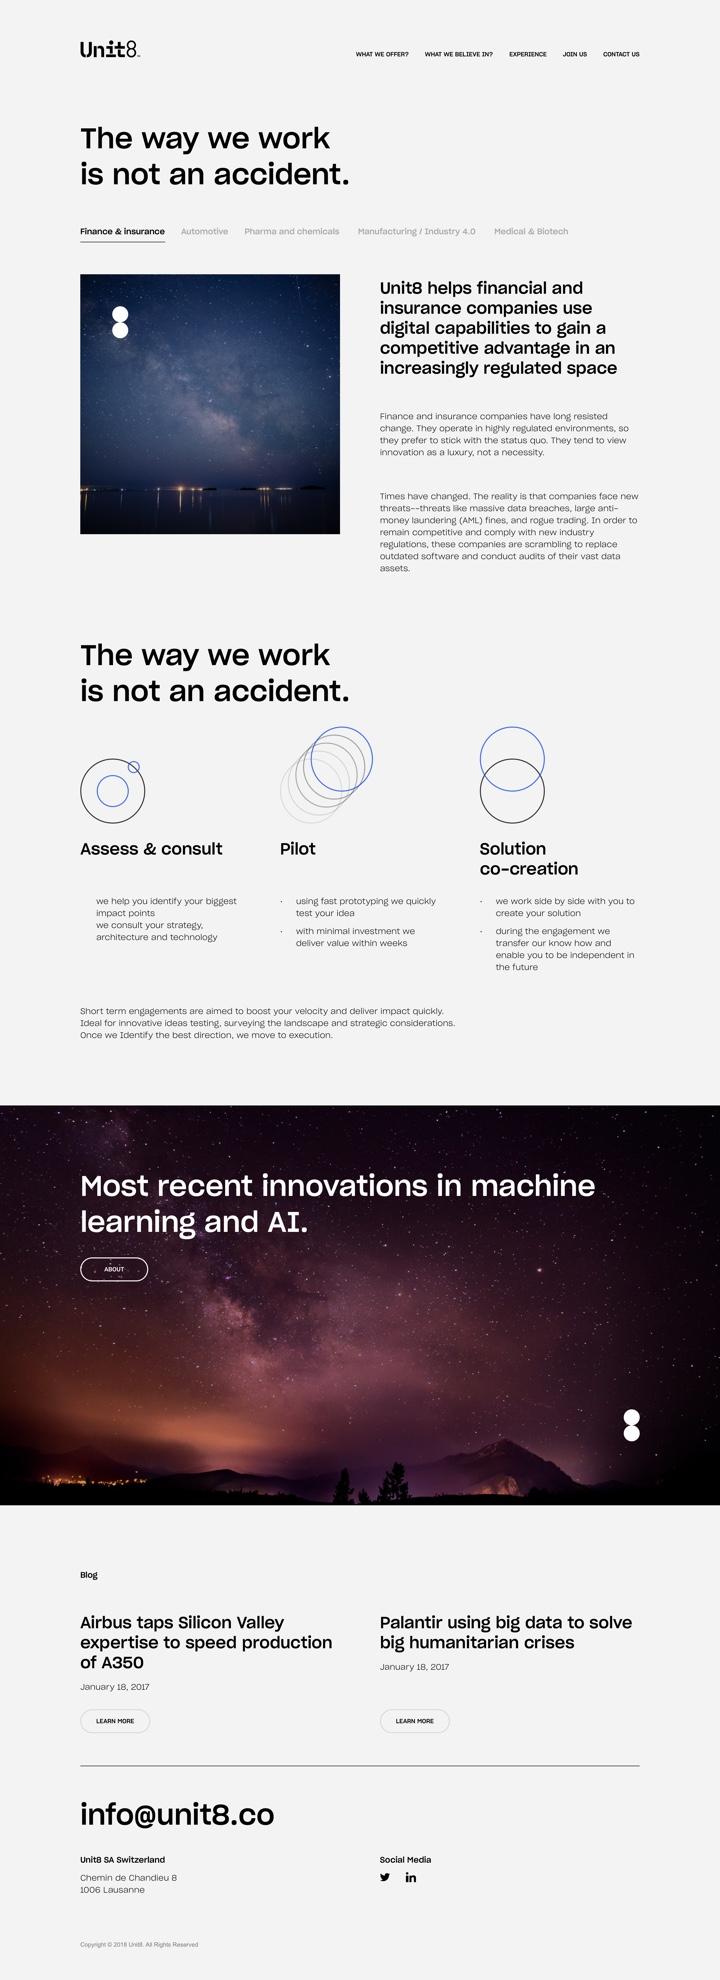 Unit 8 Case studies design by Maciej Mach